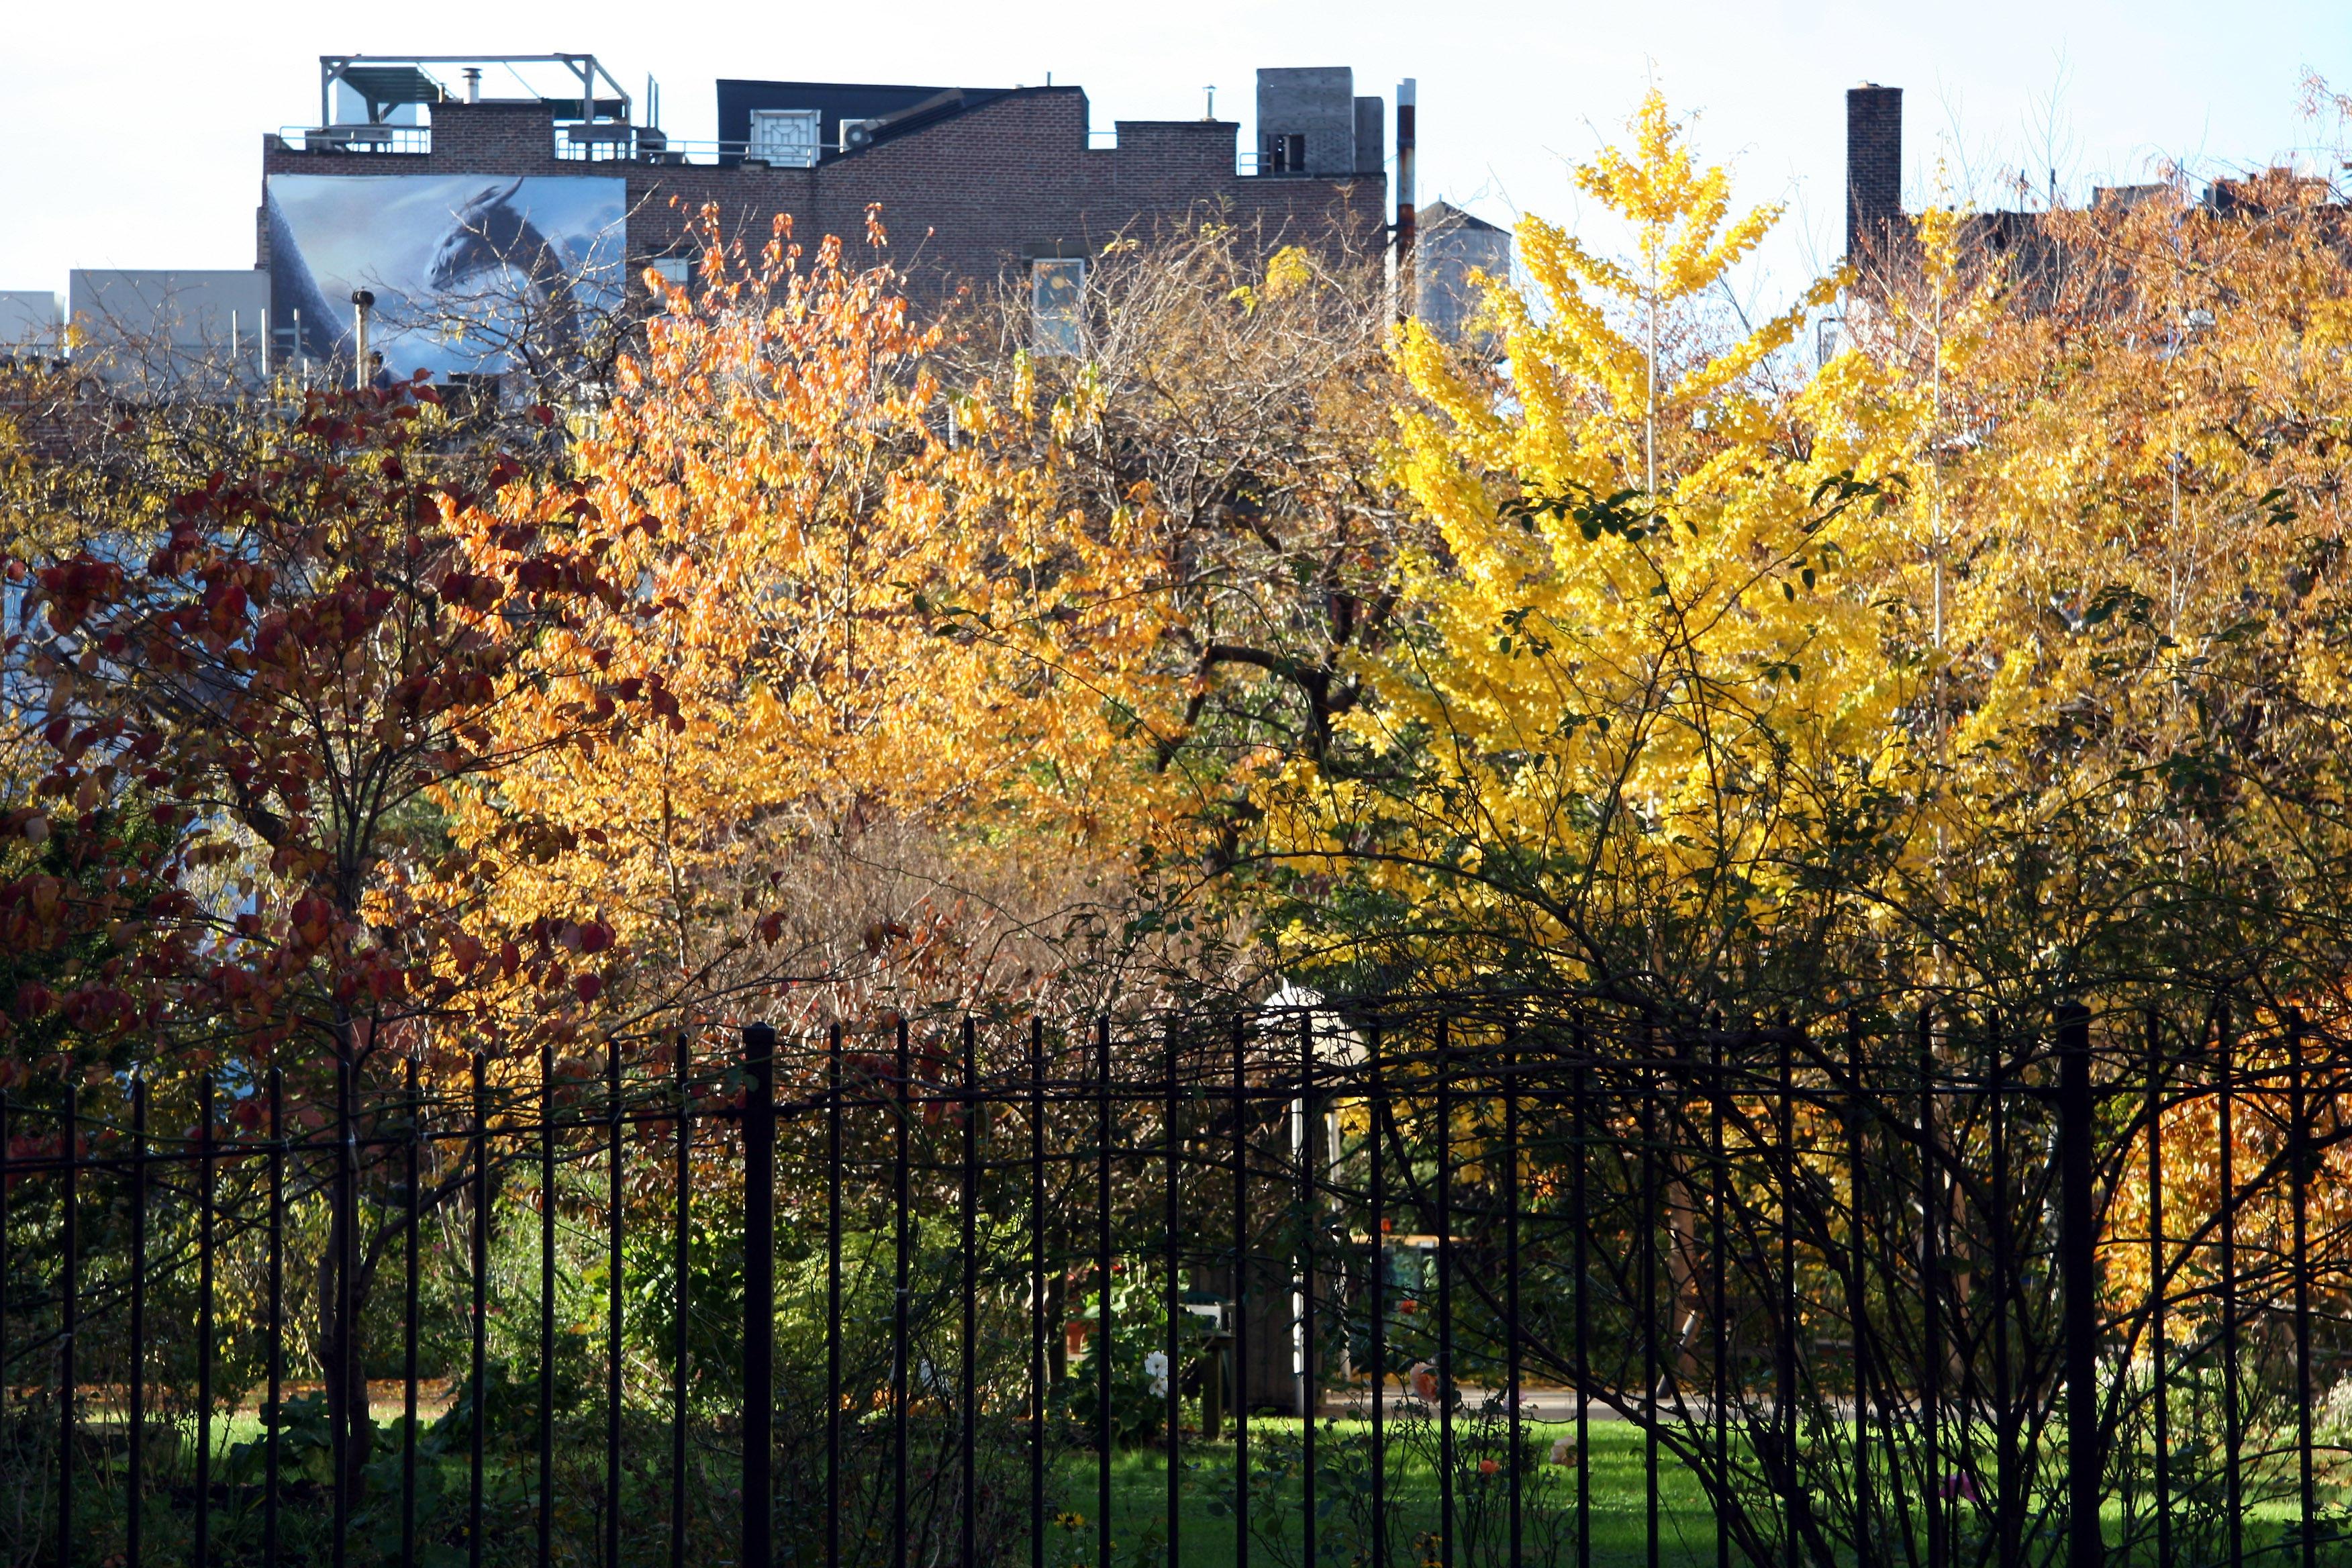 Garden View - Cherry & Ginkgo Tree Foliage